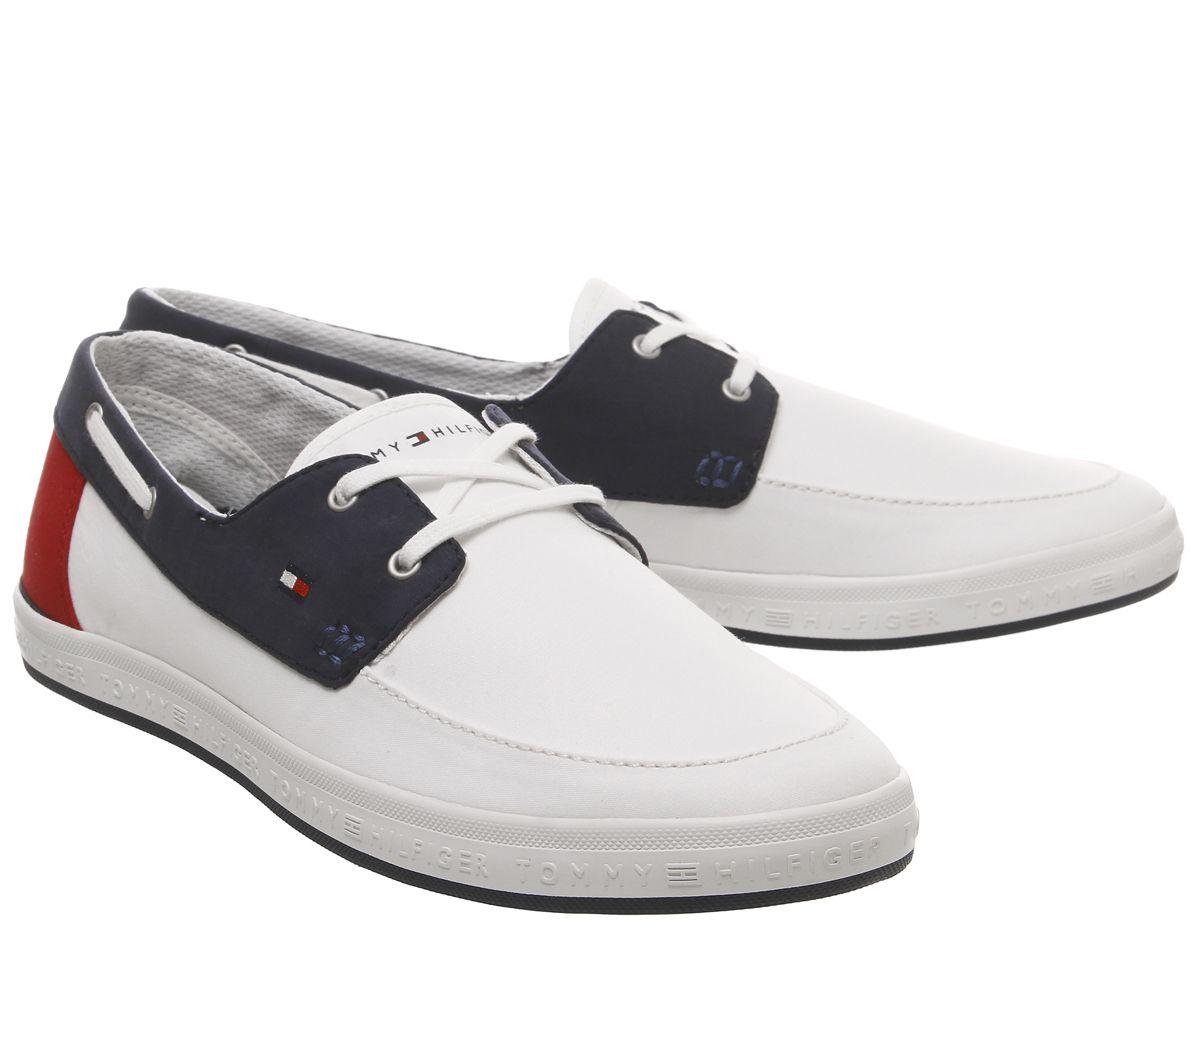 Homme-Tommy-Hilfiger-Howell-Chaussures-Rouge-Blanc-Bleu-chaussures-de-loisirs miniature 7